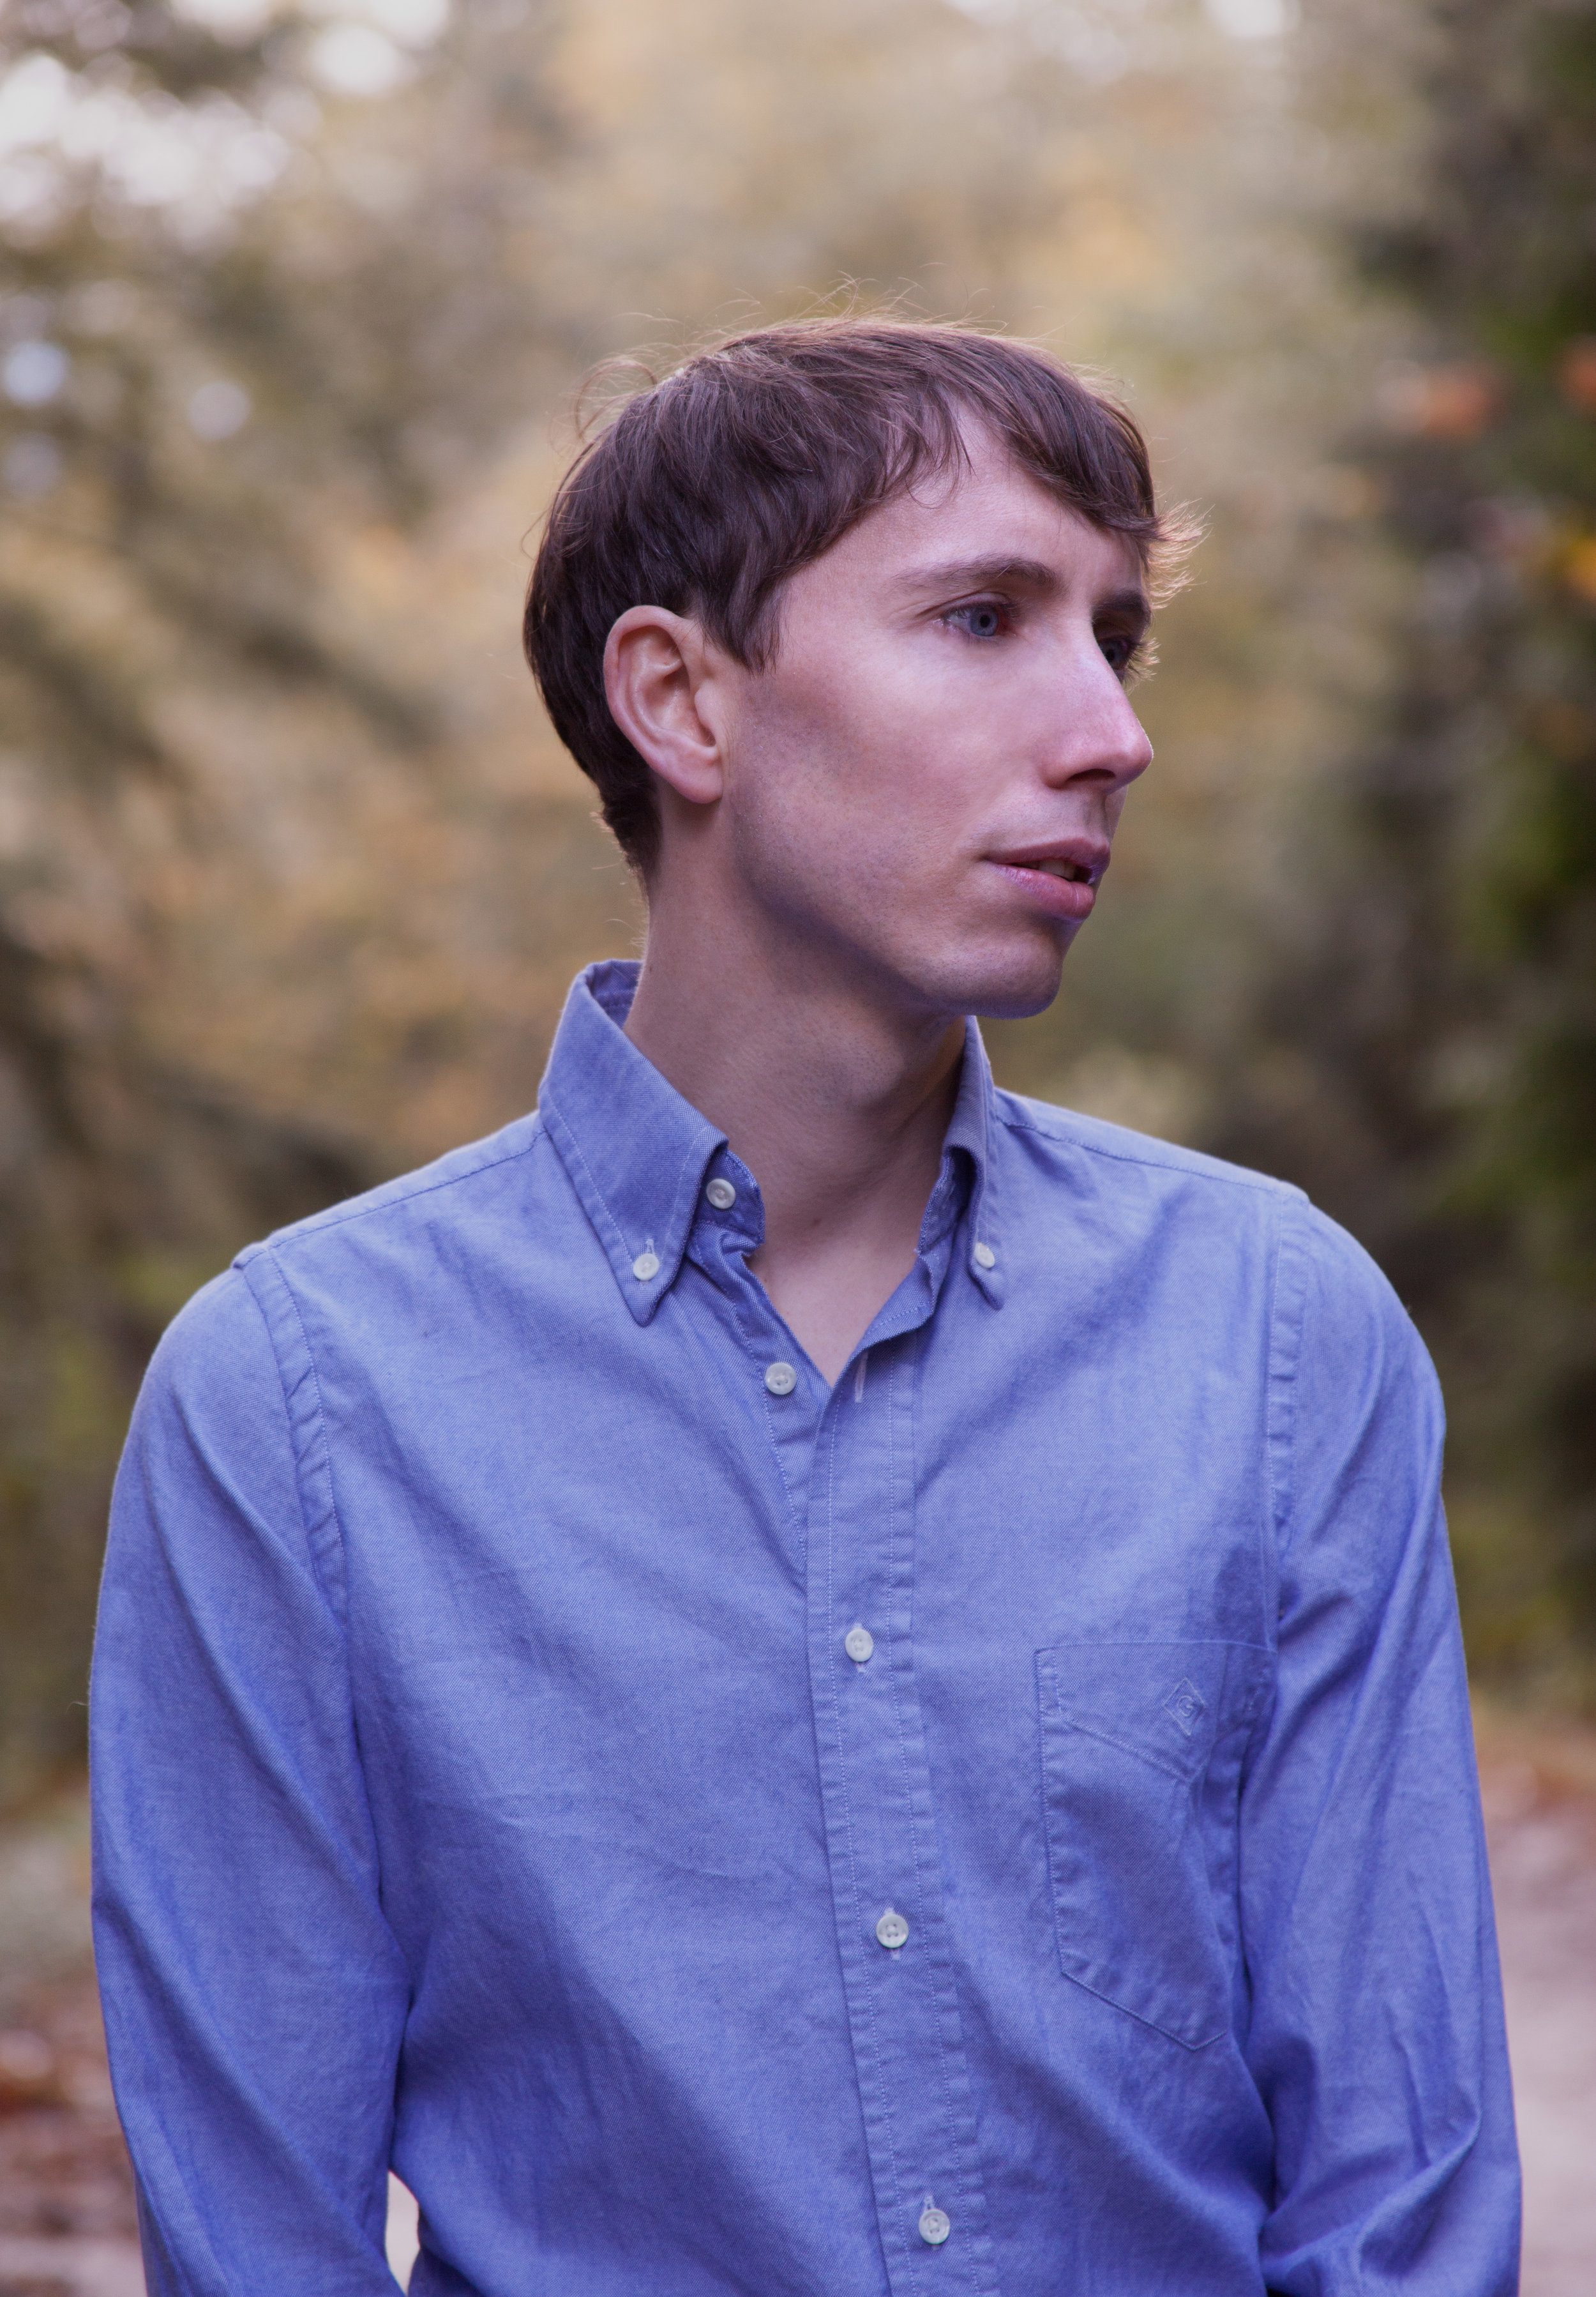 Chris Riffle / Musician